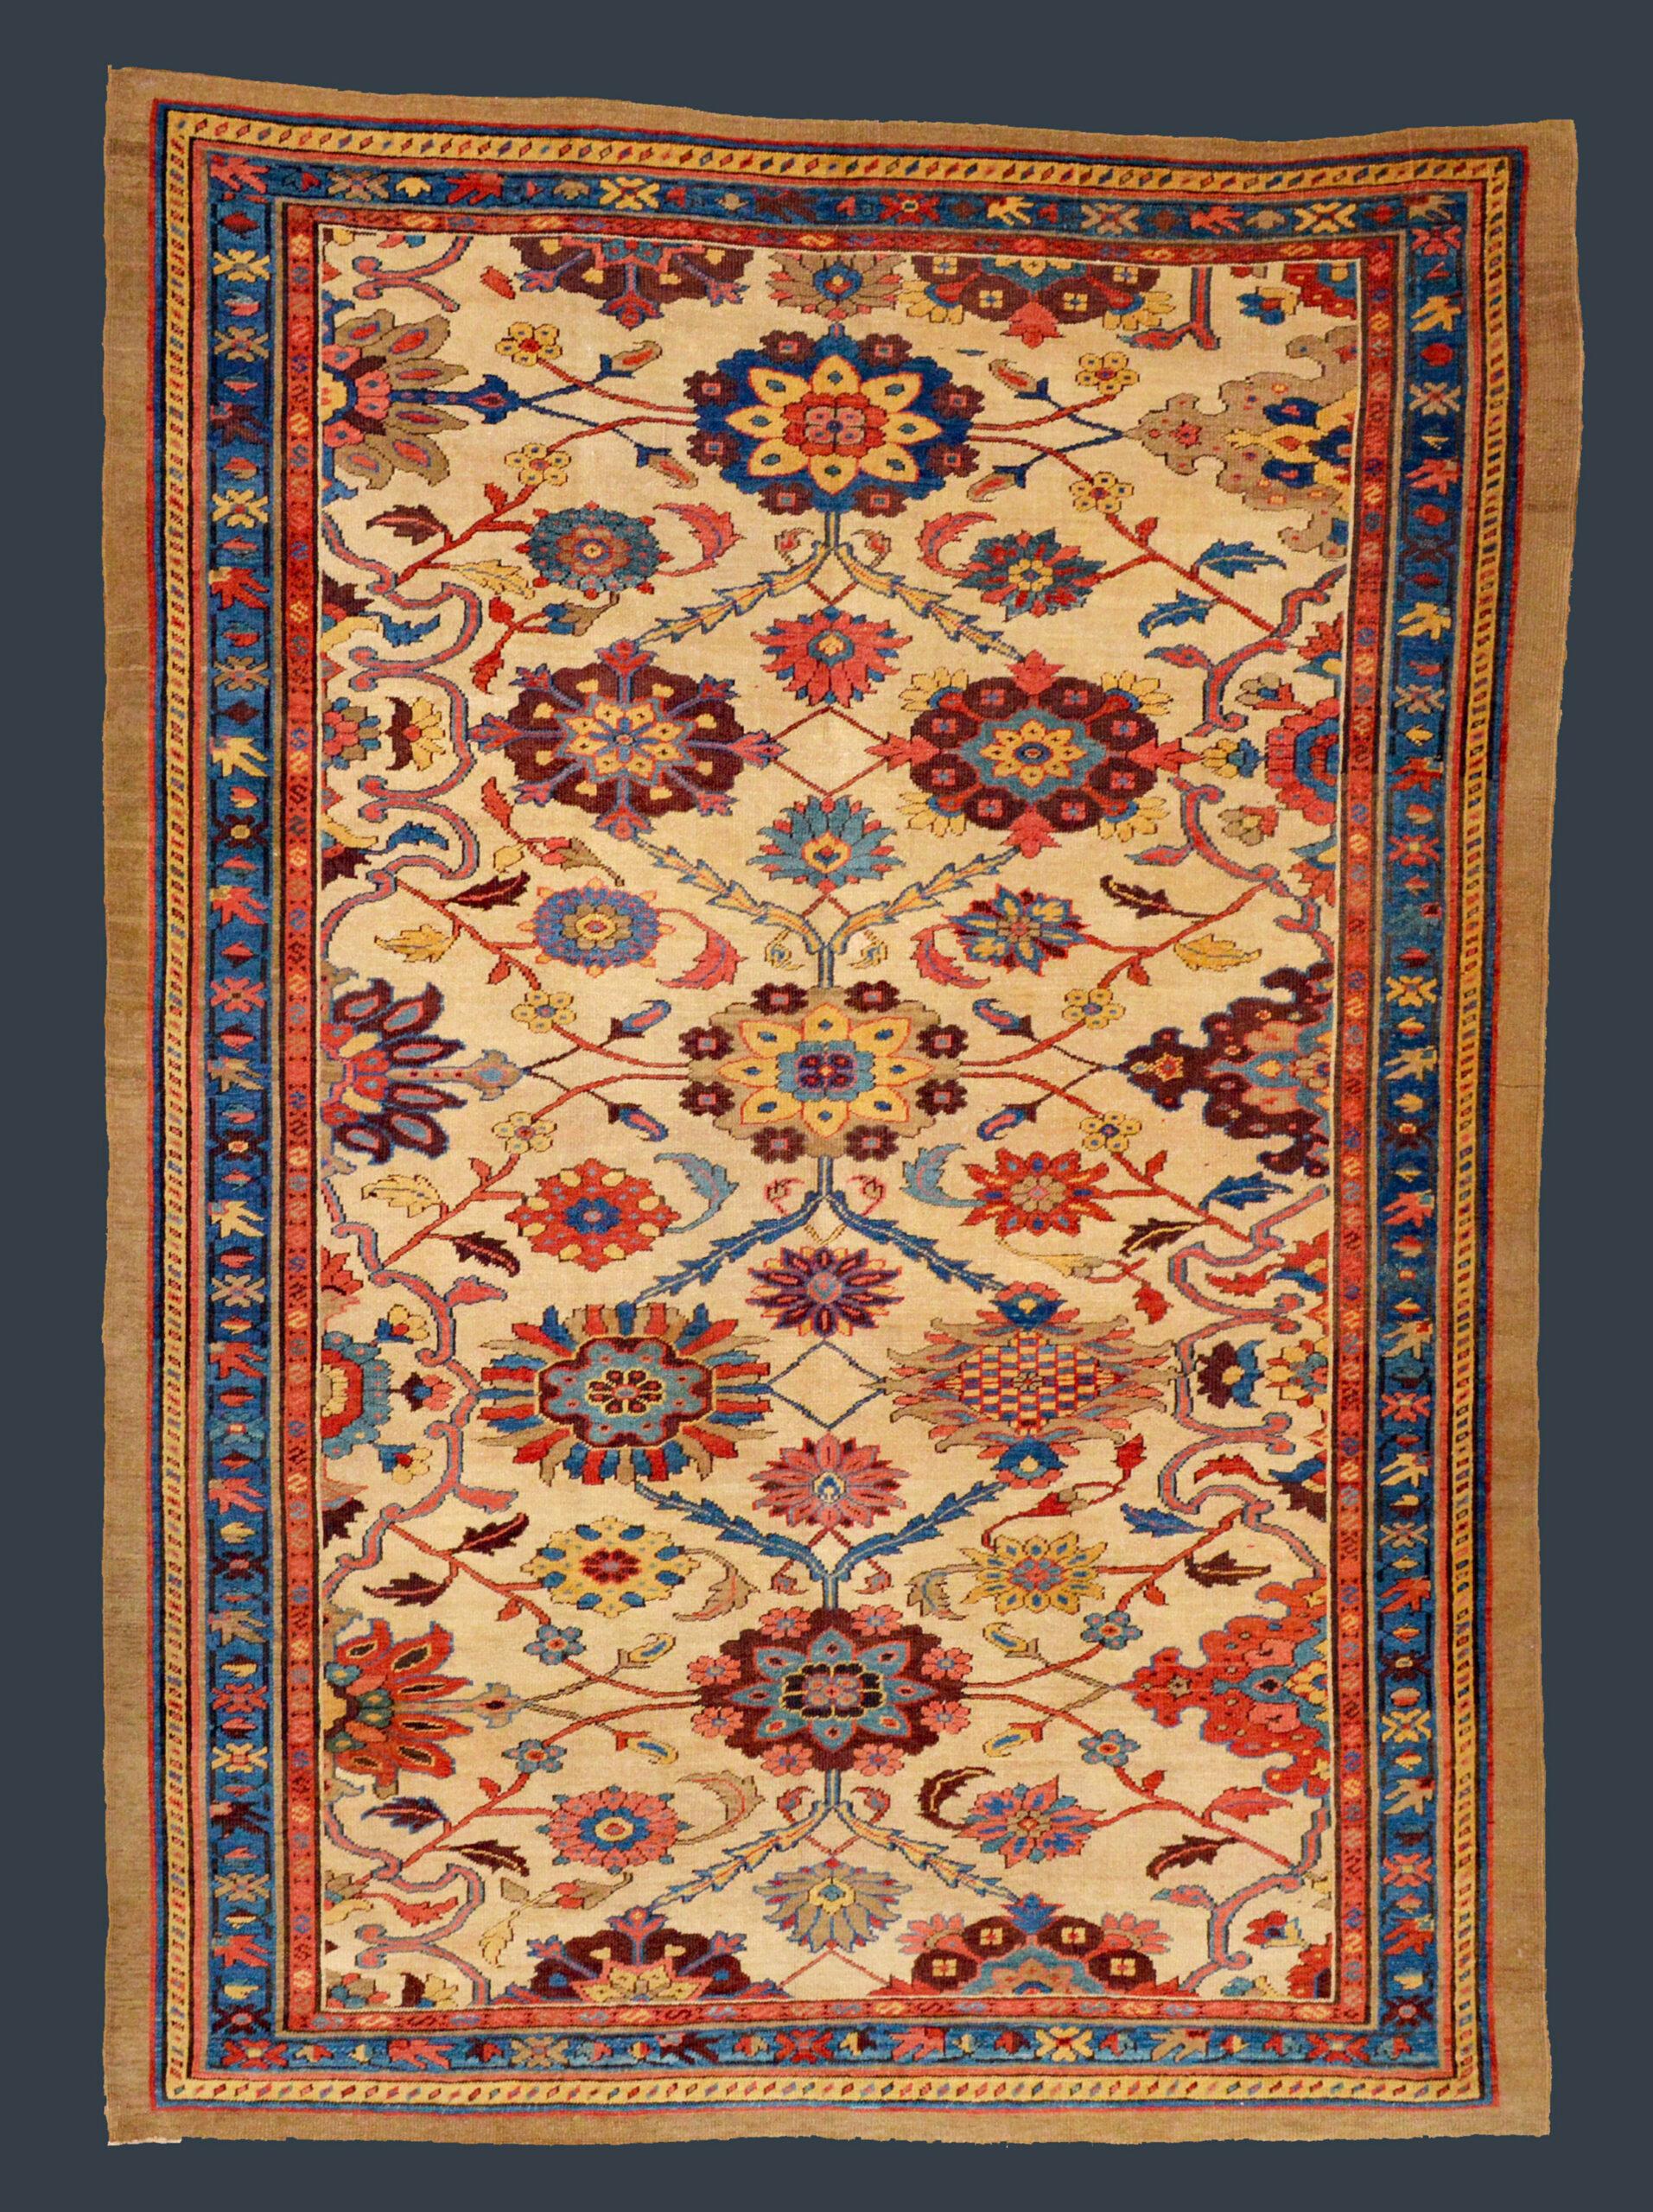 Antique northwest Persian Bakshaish rug from the Heriz area